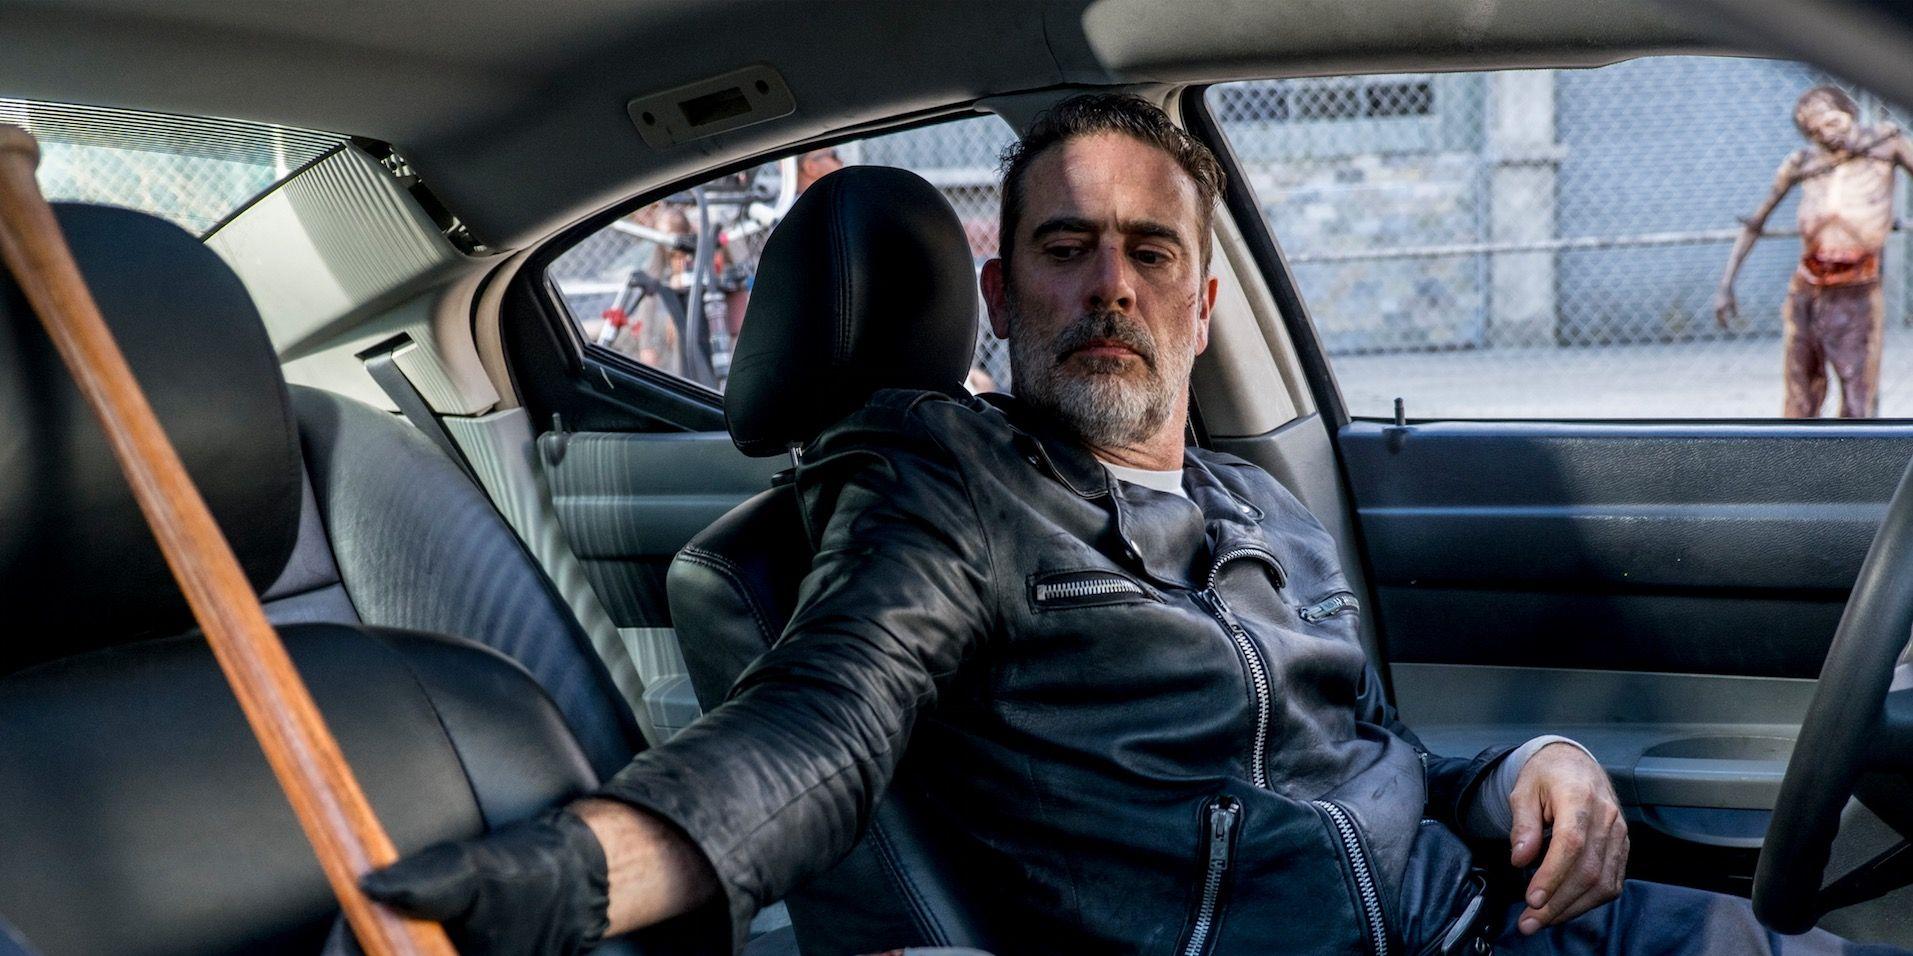 The Walking Dead s08e12: Negan